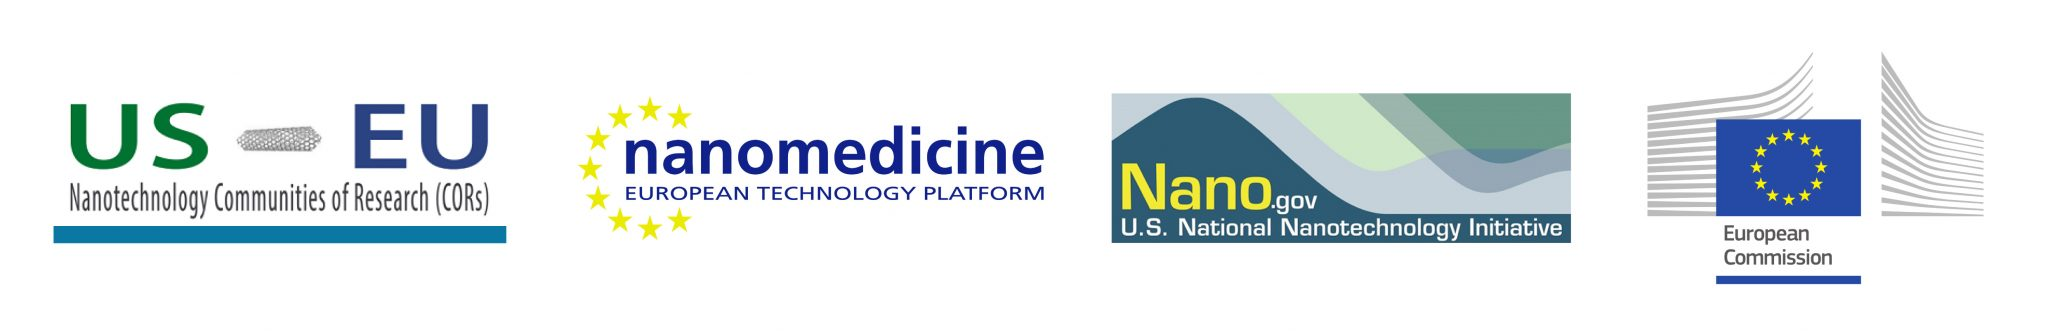 Nanomedicine CoR Partners logos